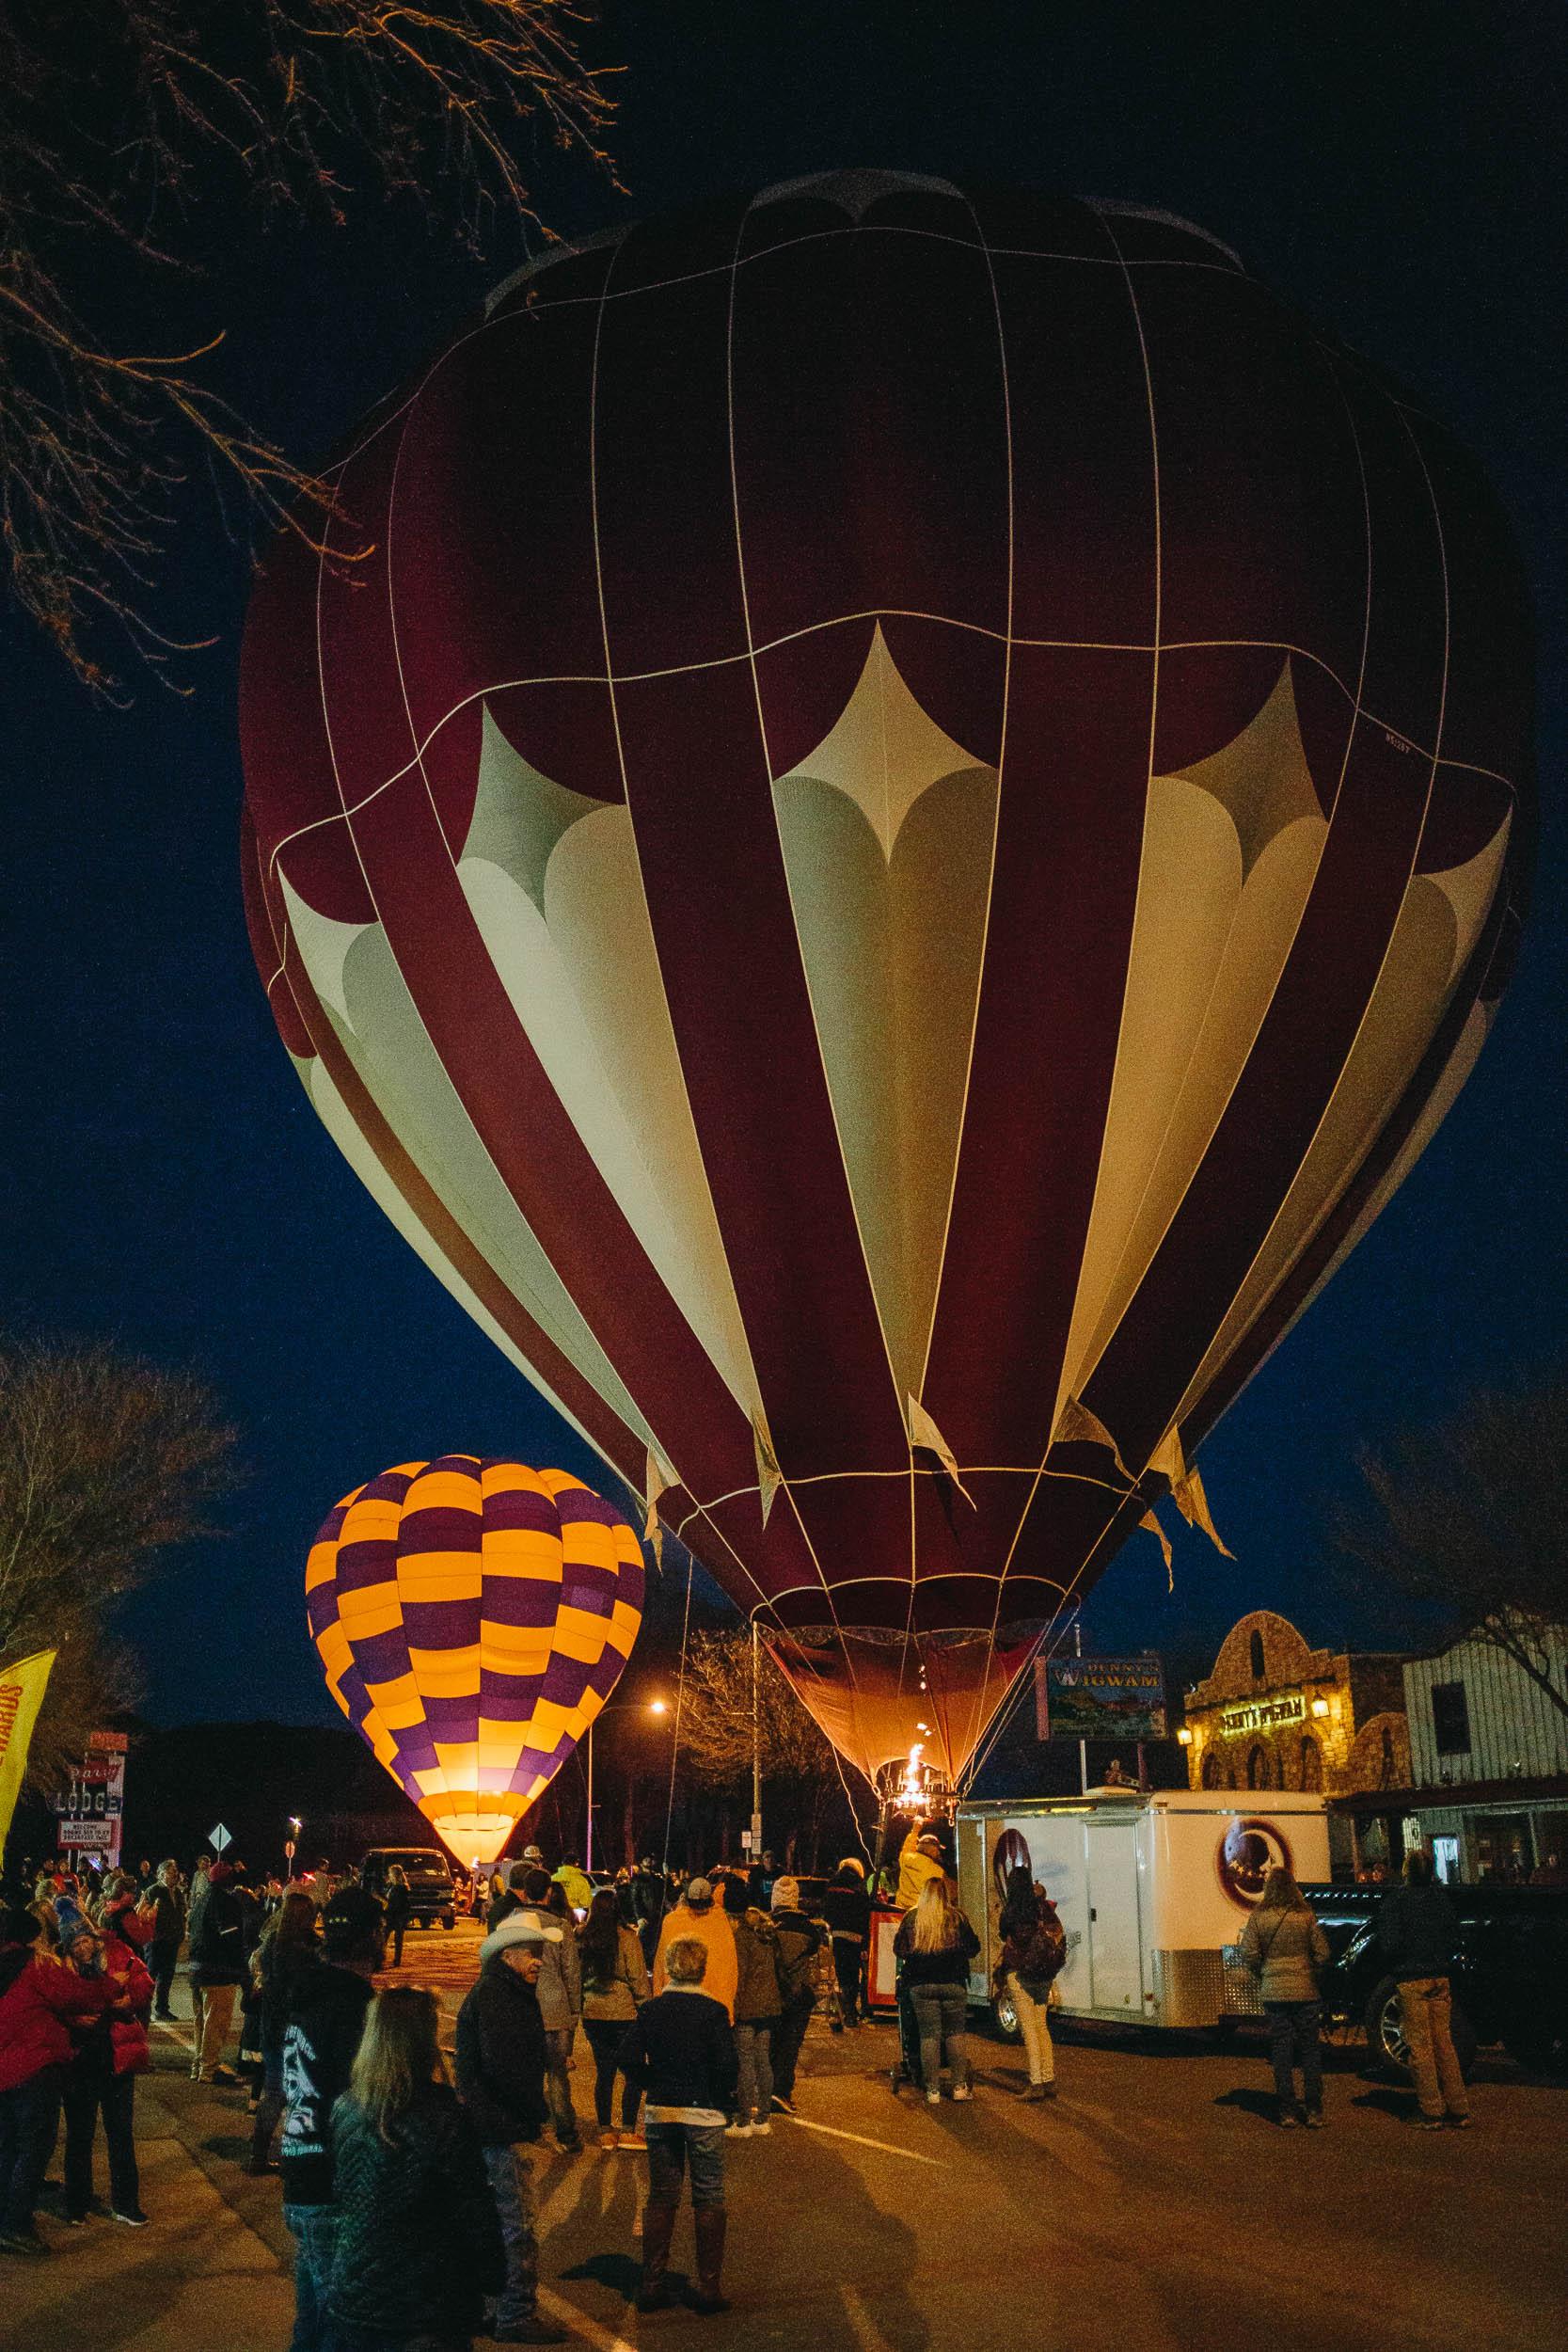 Kyle-Sheppard-Kanab-Balloon-Festival-41.jpg